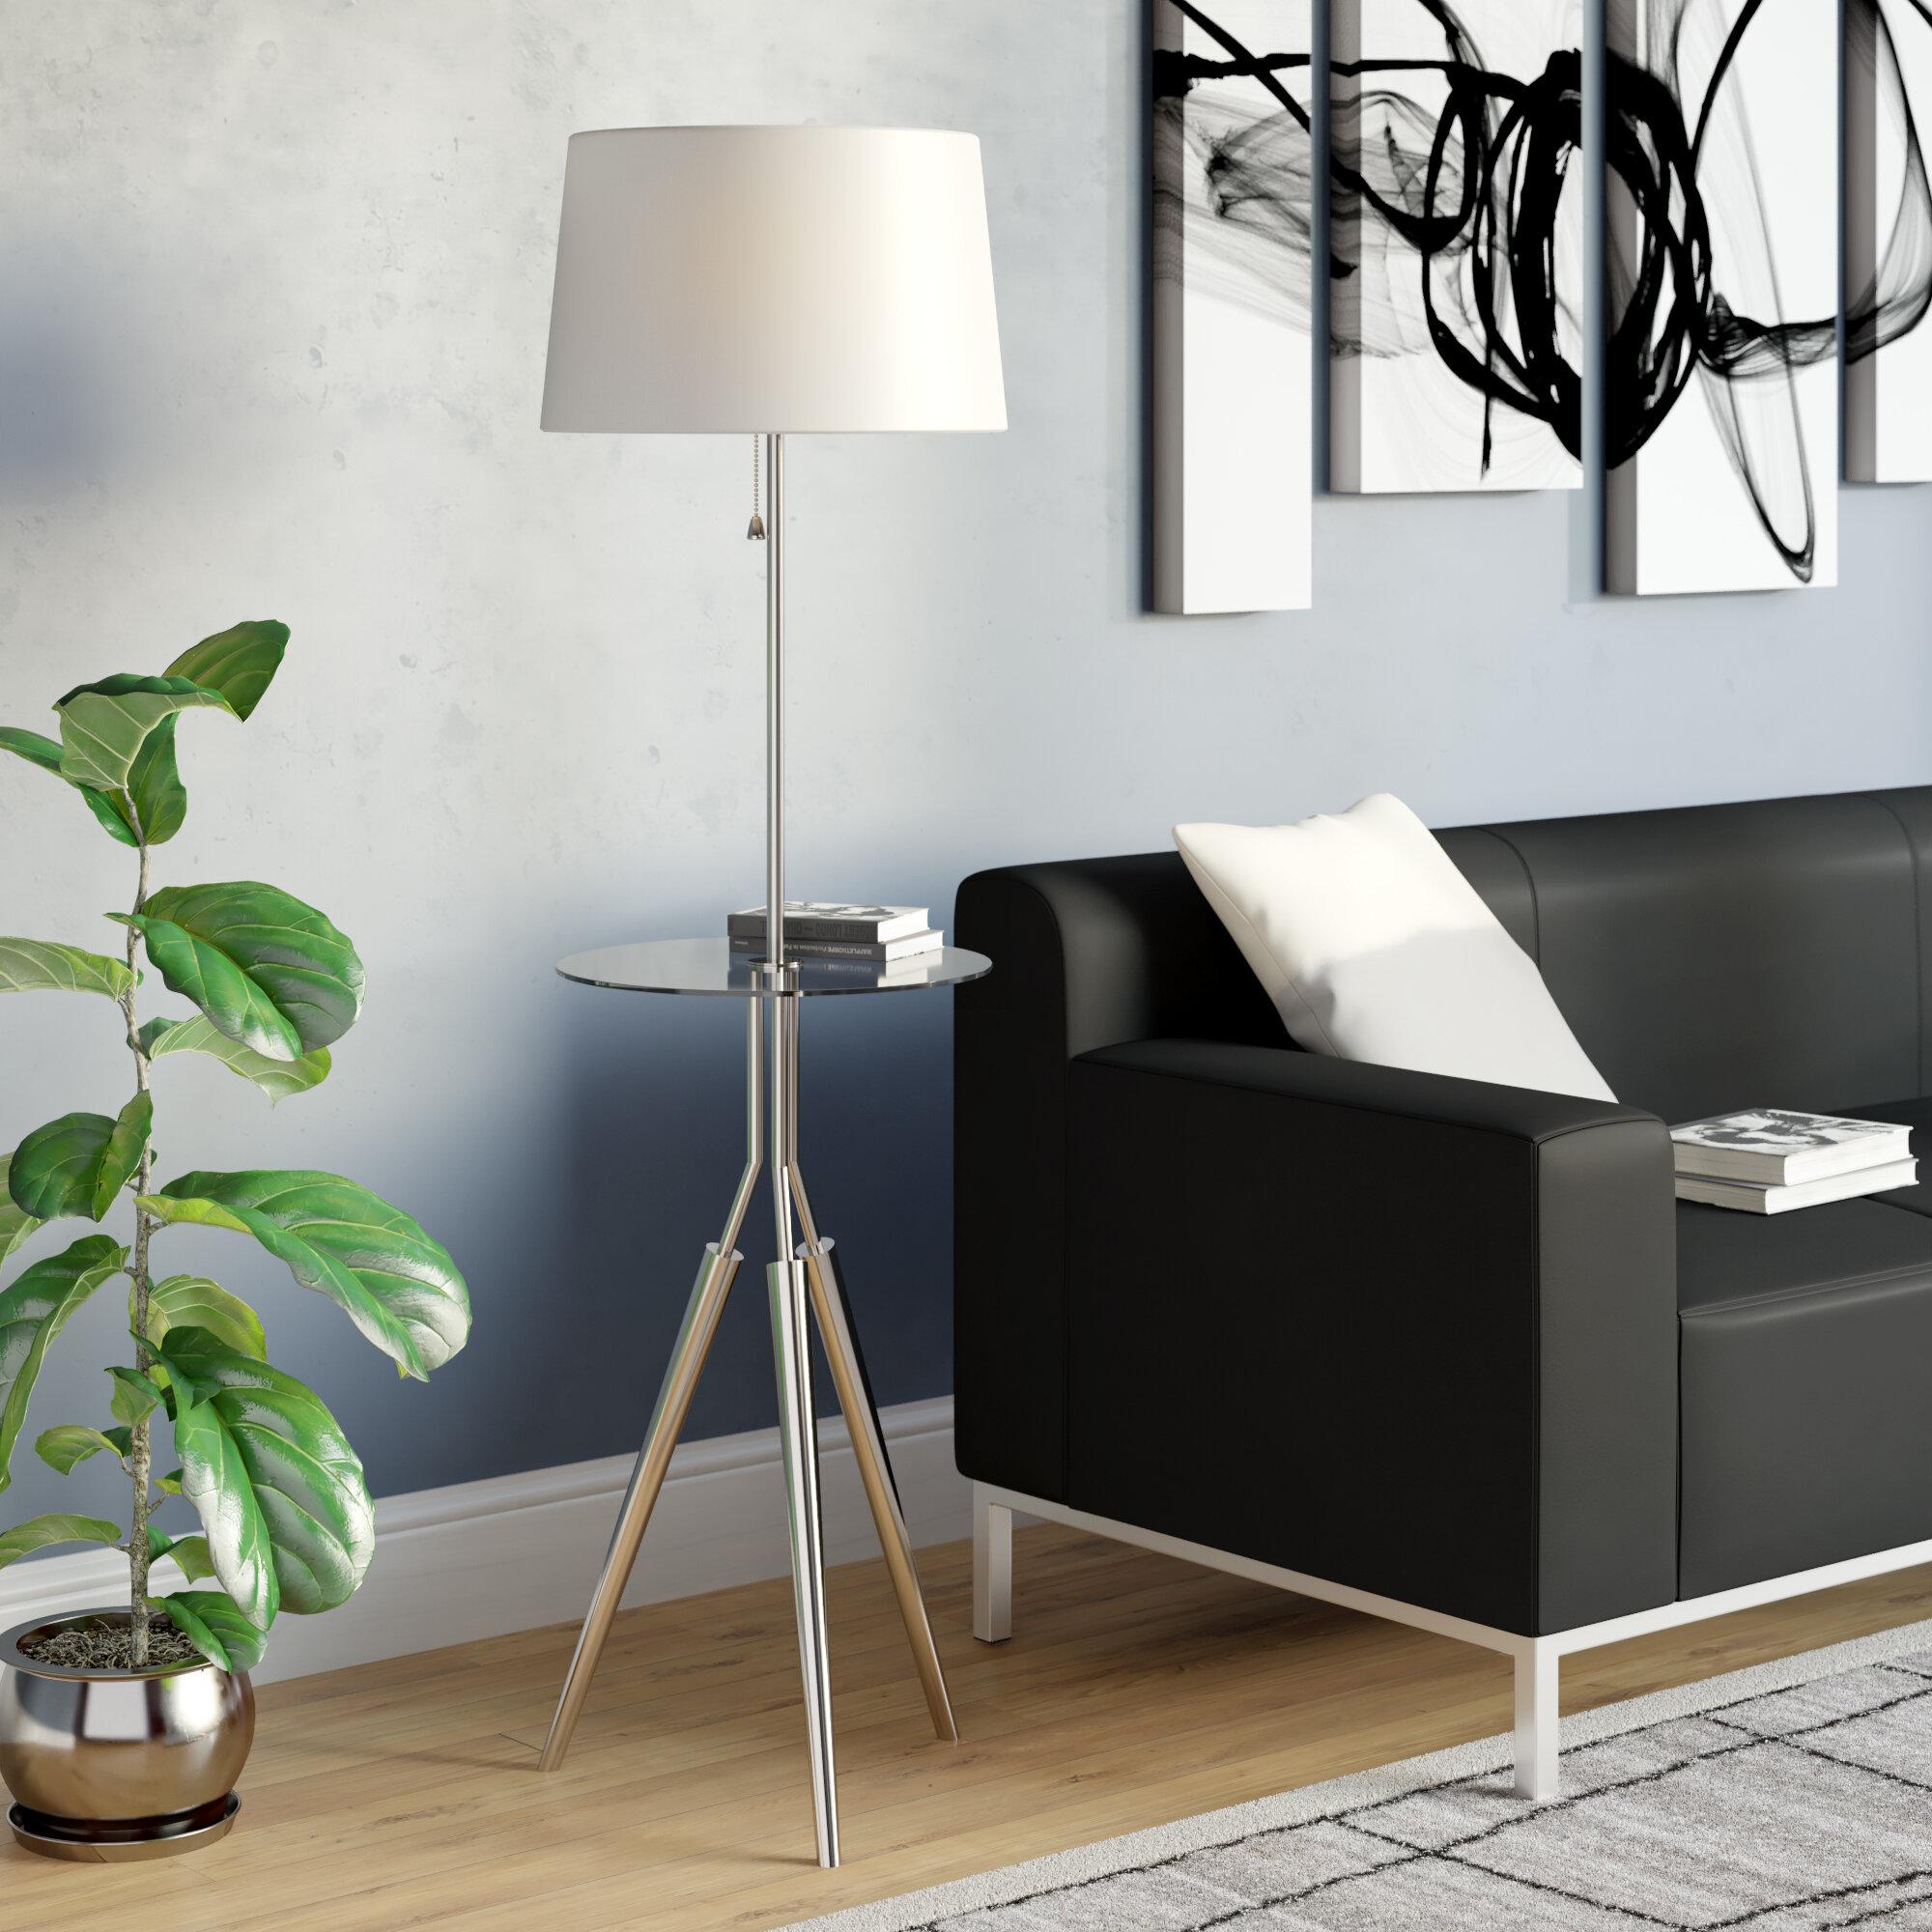 Brayden Studio Garton 58 Tray Table Floor Lamp Reviews Wayfair